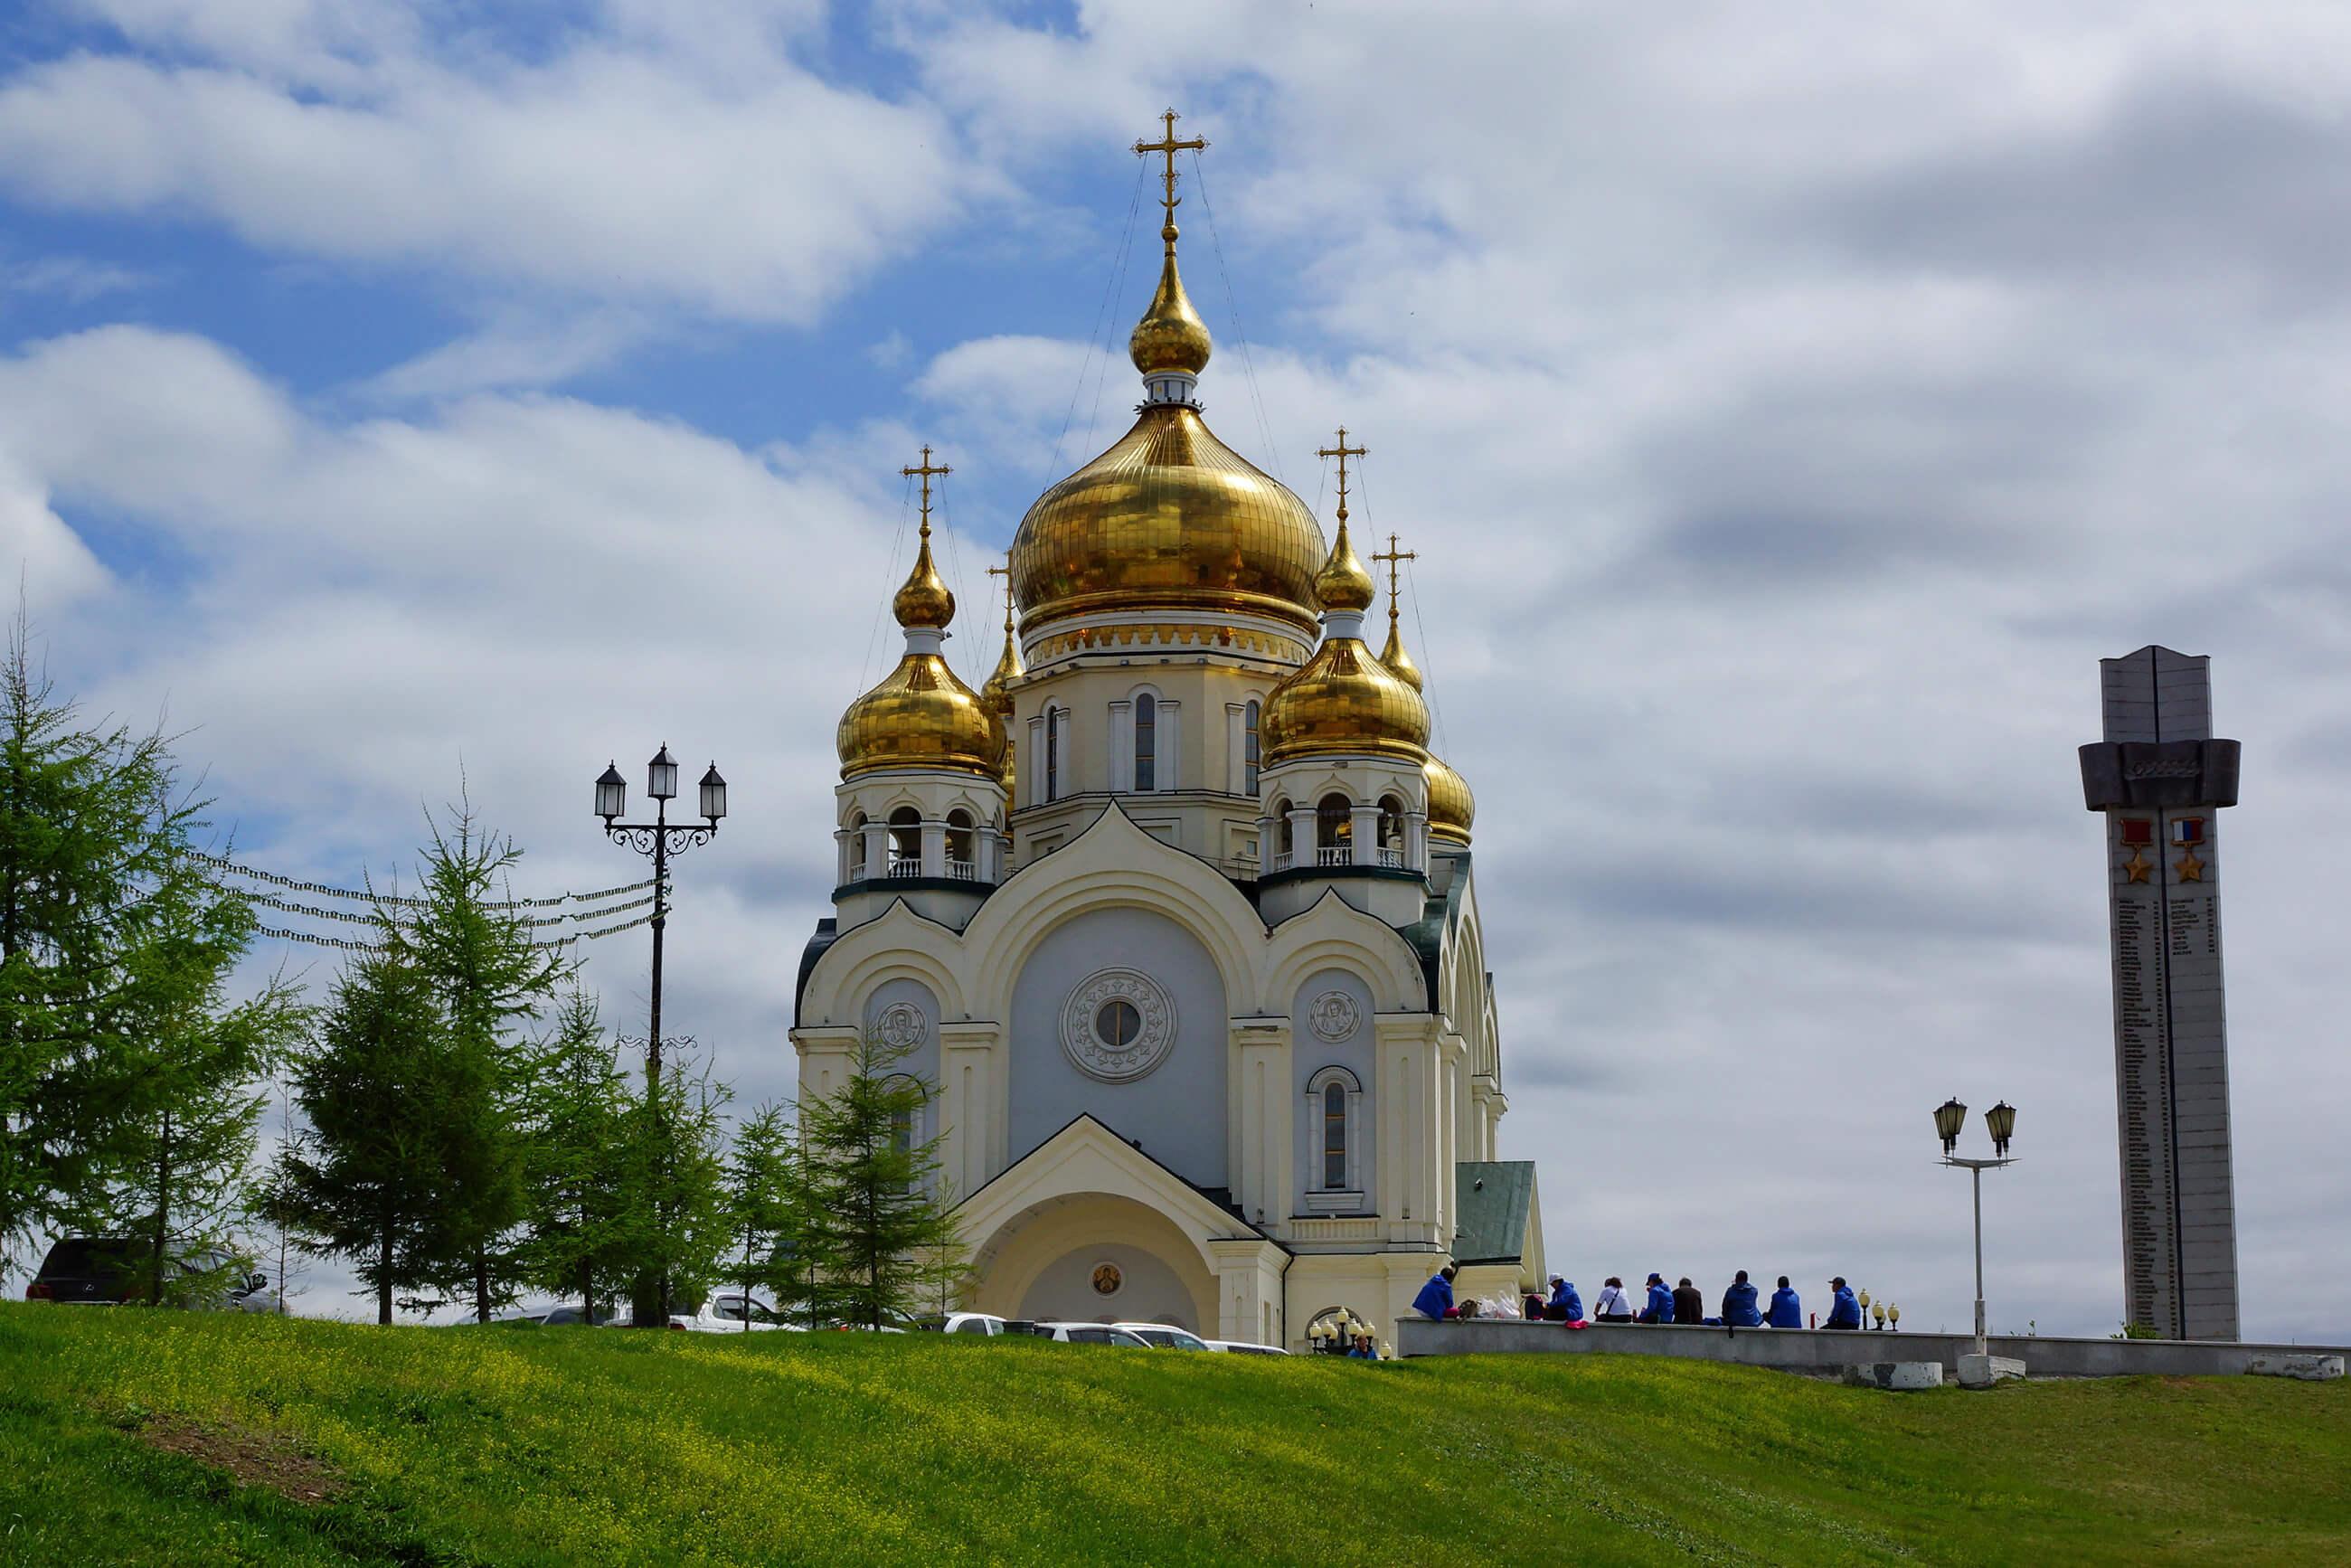 https://bubo.sk/uploads/galleries/7219/rusko_chabarovsk_cathedral-885670.jpg